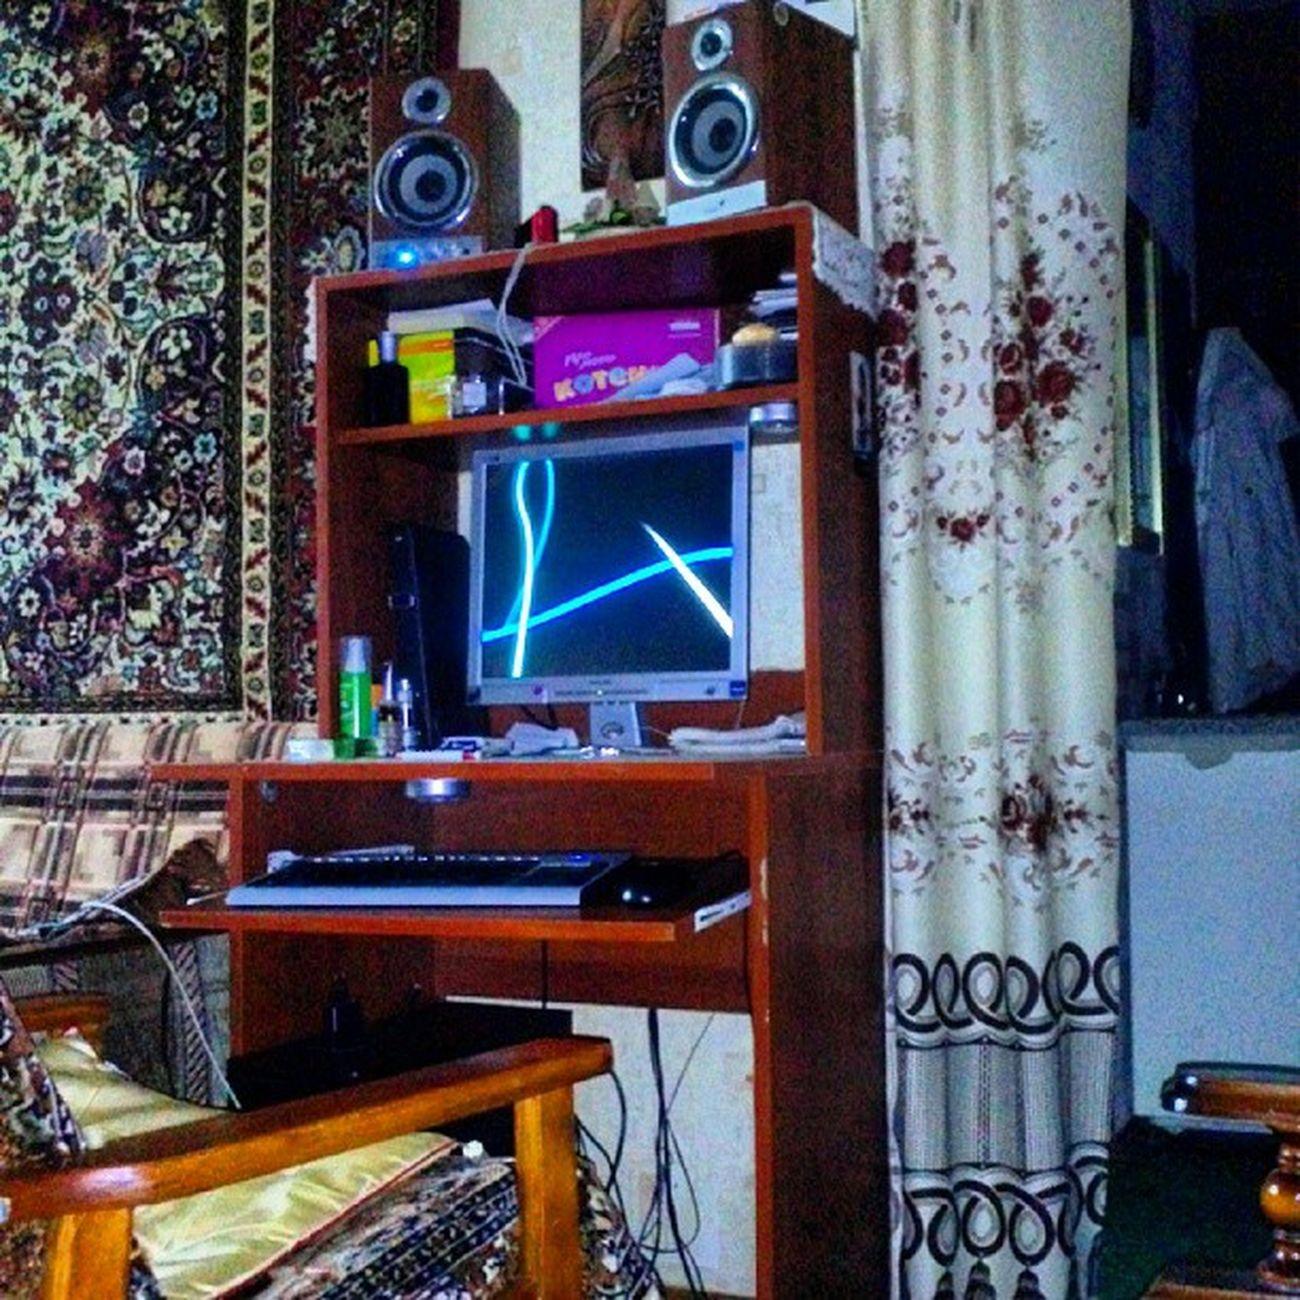 компьютер система дома домашнее отдыхаю computer computers system desktop home russia